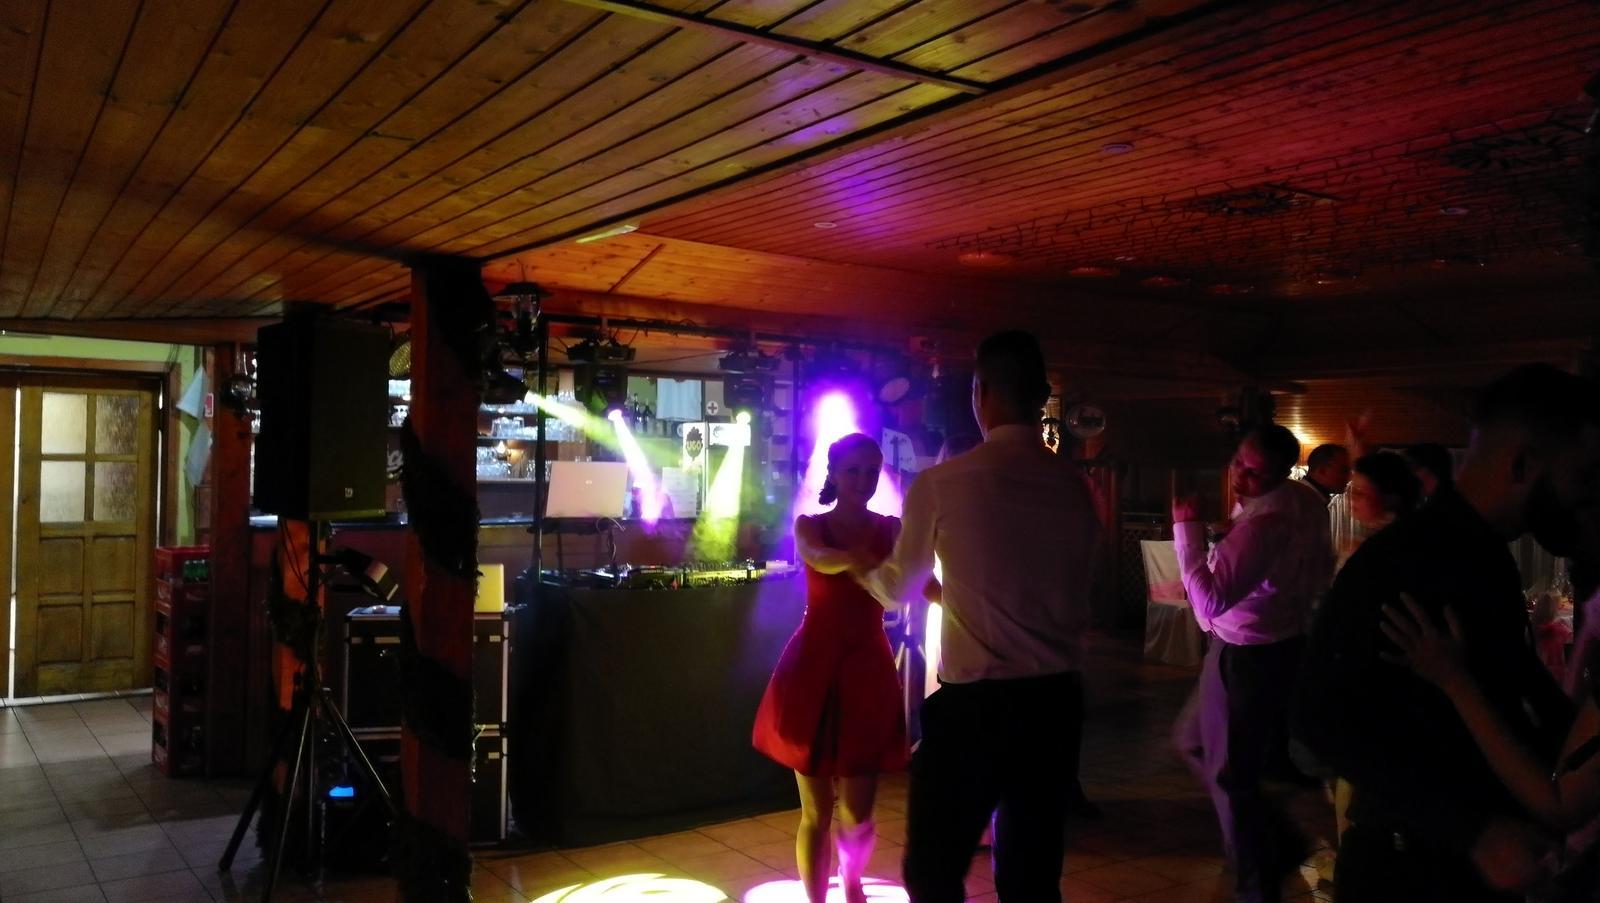 djmarco - Svadba Ranč u Bobiho N.Tekov